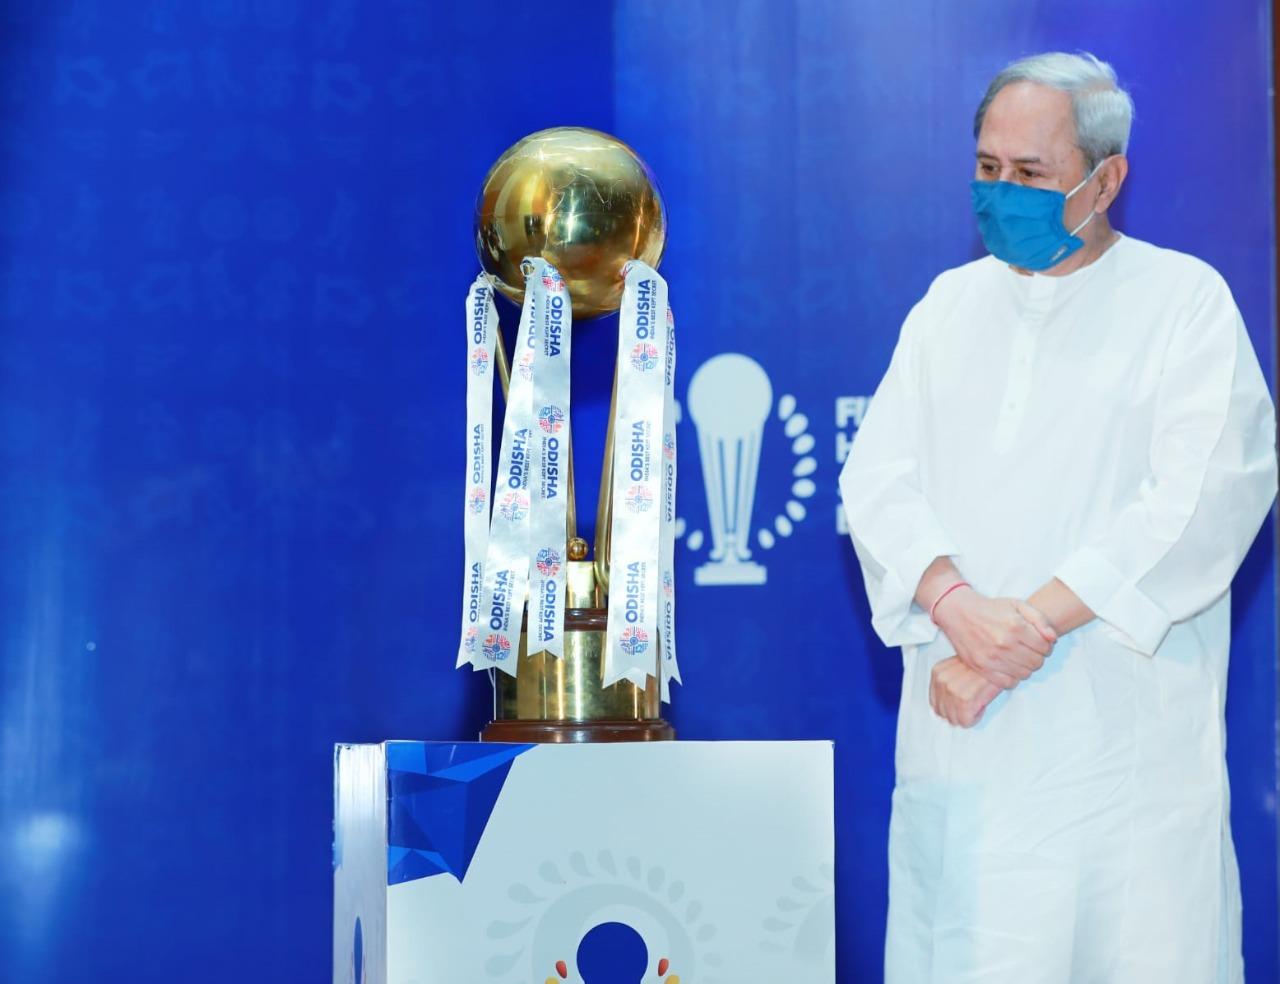 CM Announces Odisha to Host Prestigious FIH Junior Men's Hockey World Cup